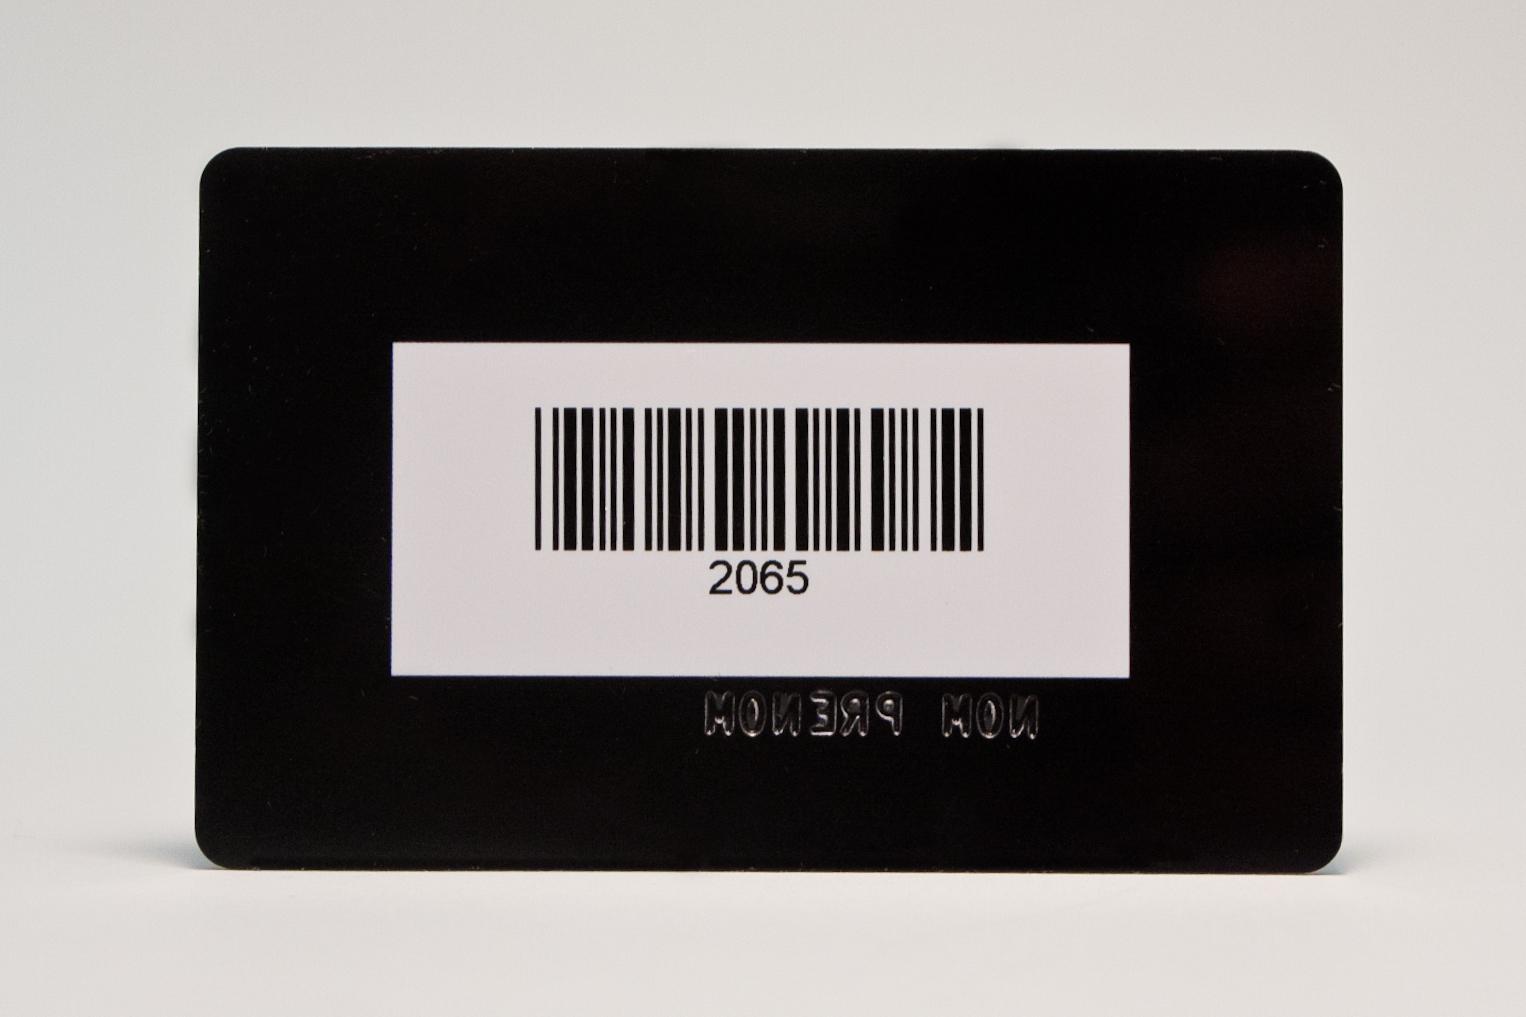 carte pvc rfid code